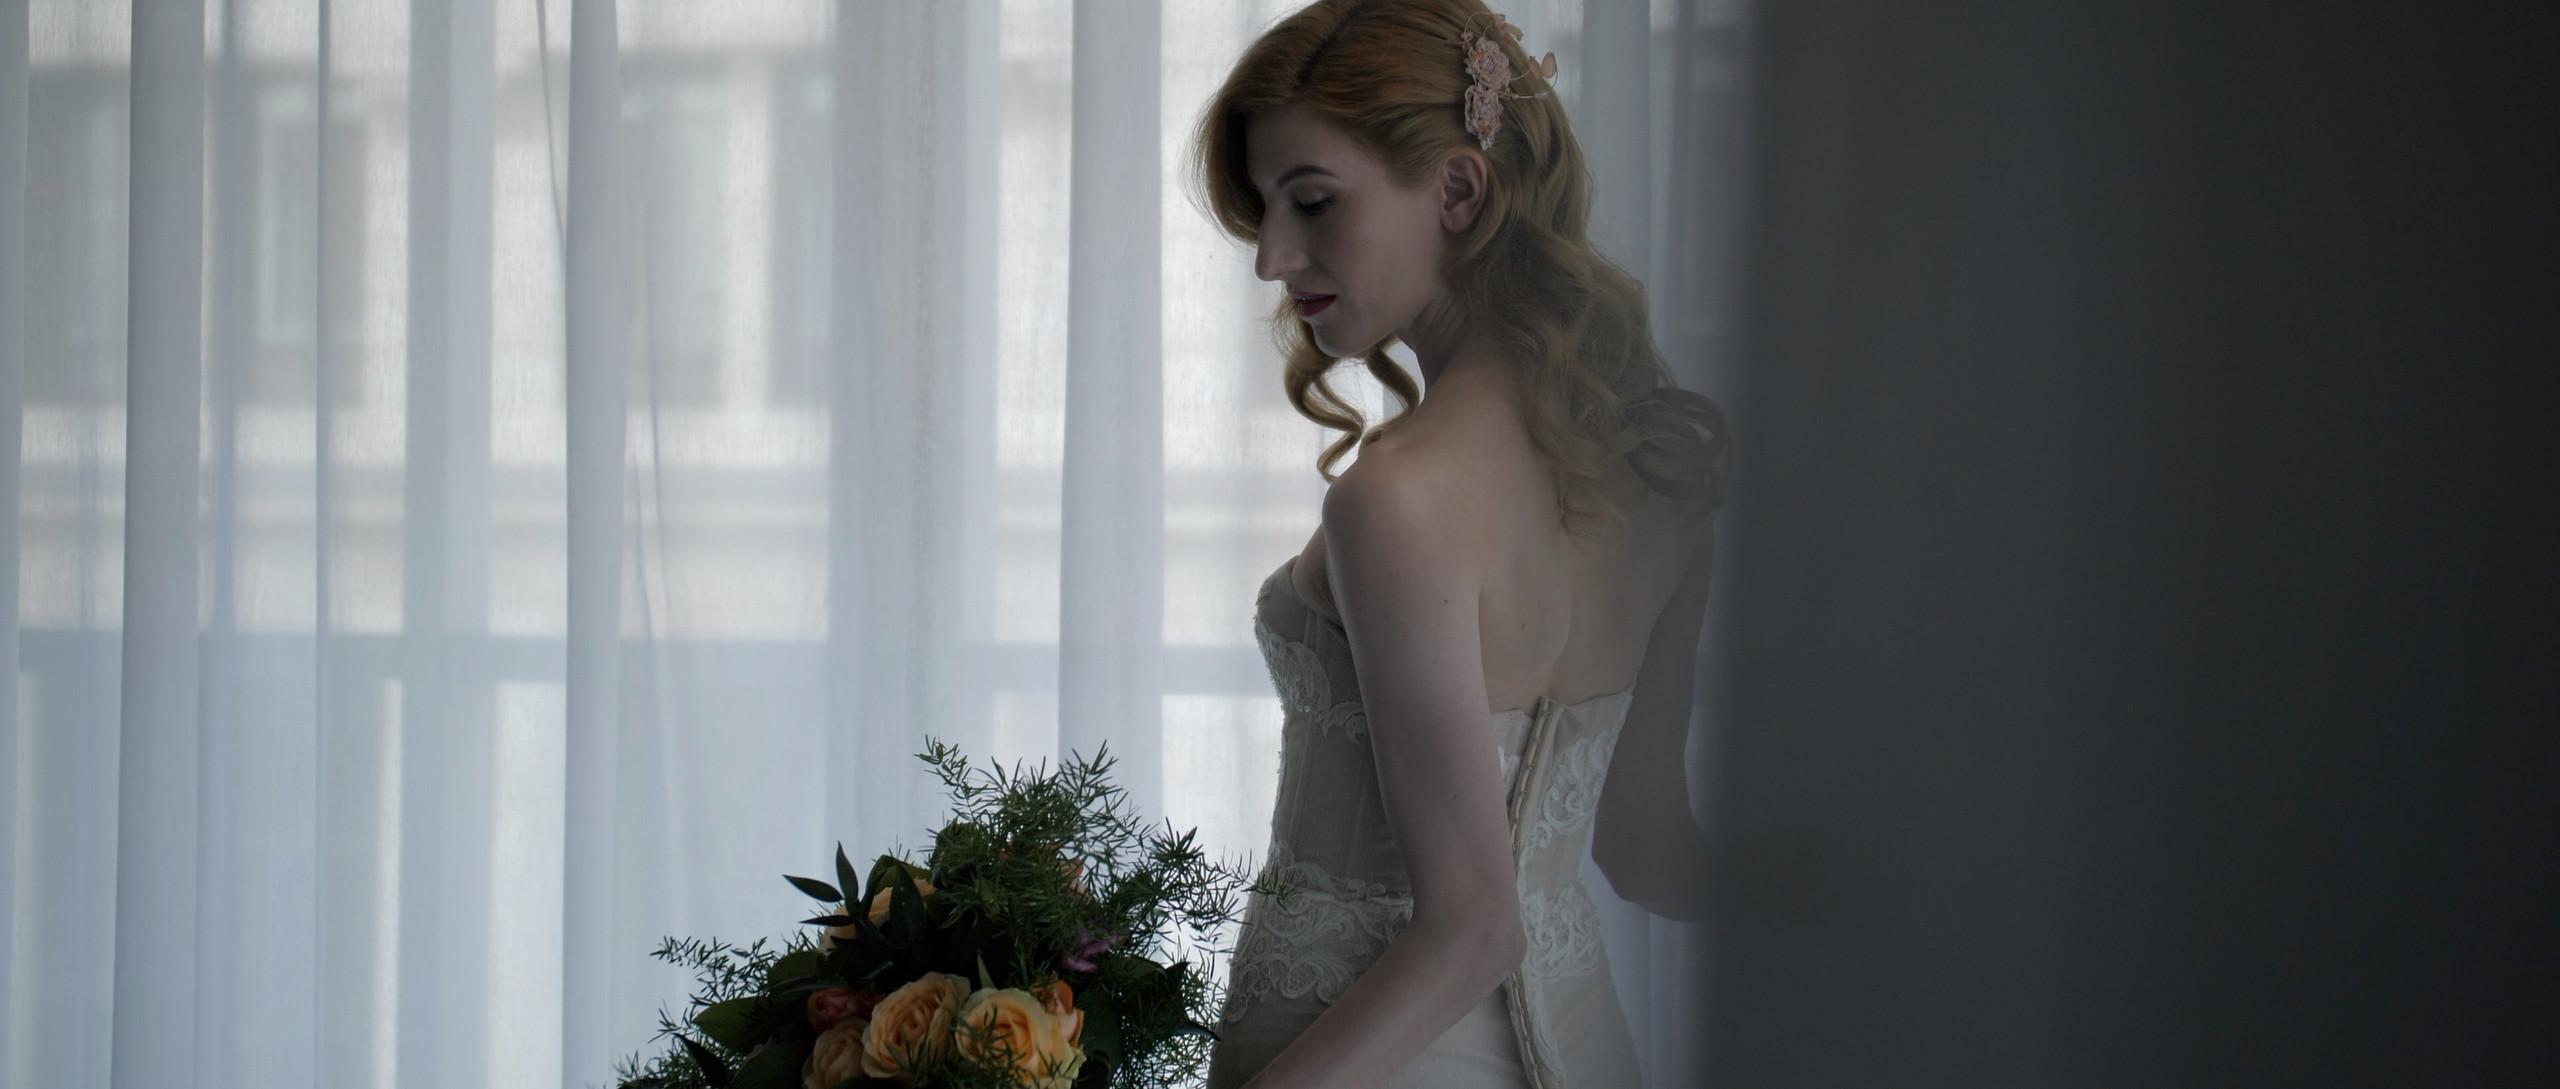 bride turned away london wedding videographer film